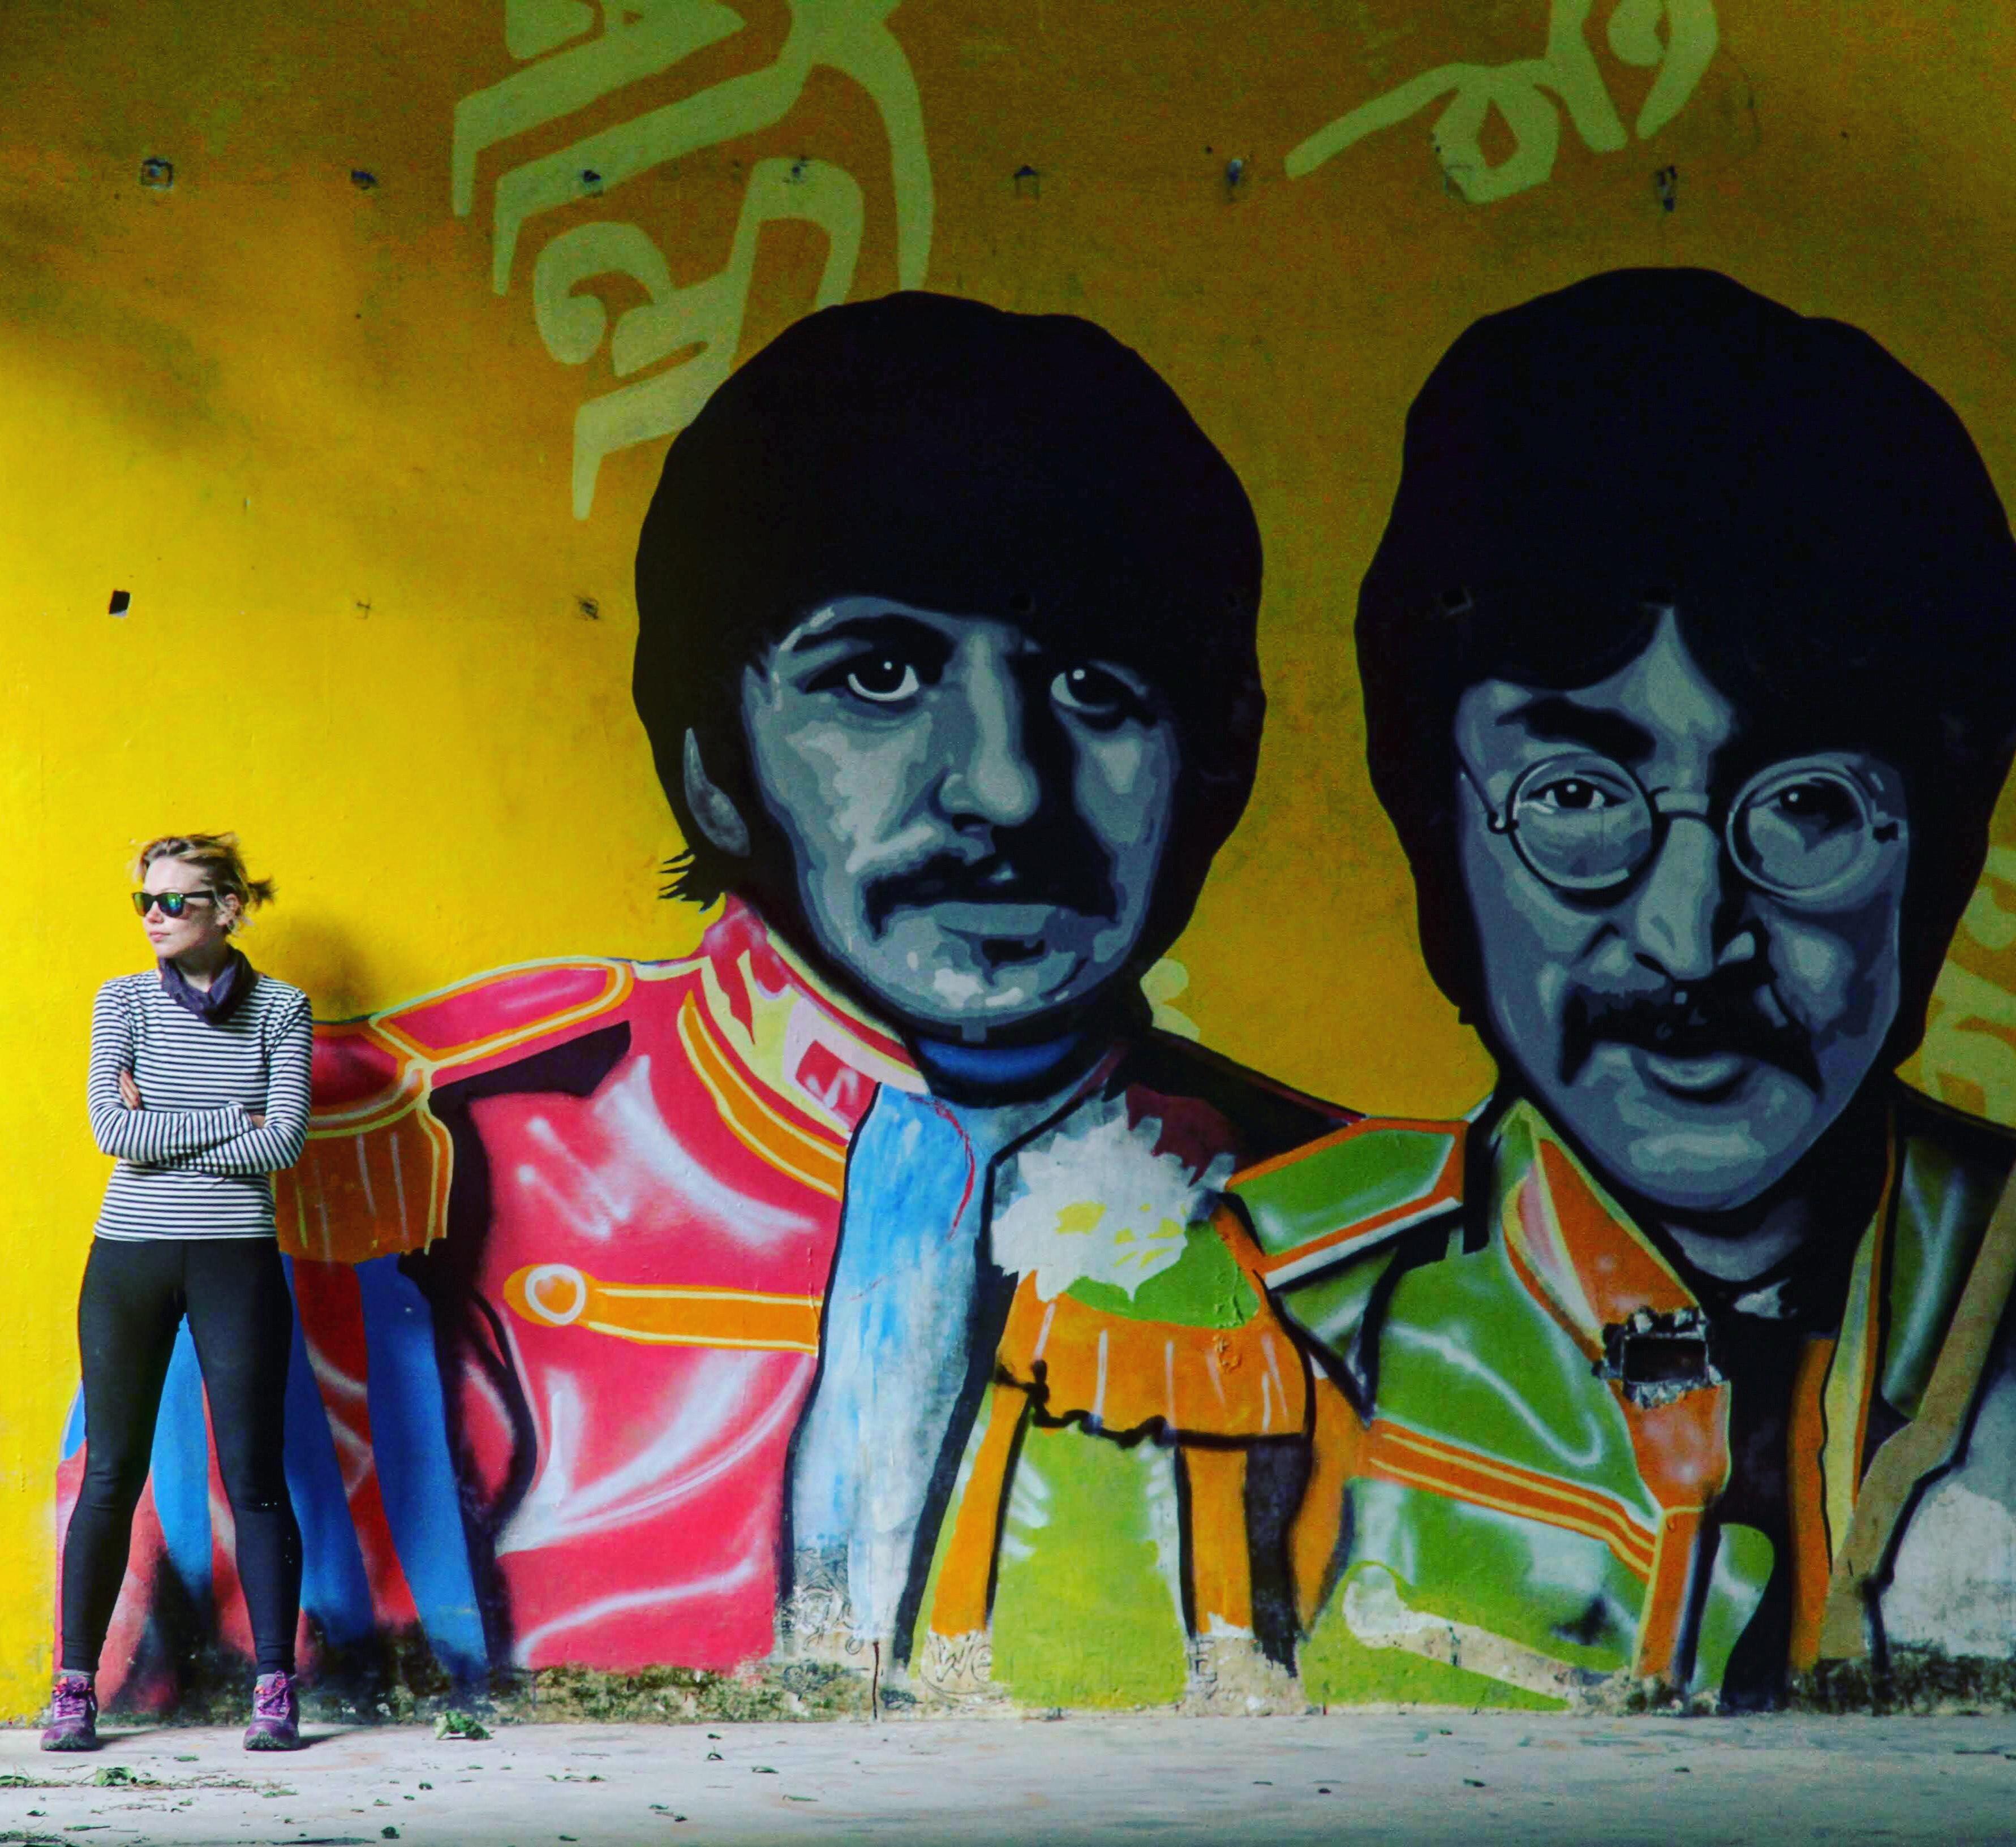 George and John graffiti, The Beatles Ashram, Rishikesh